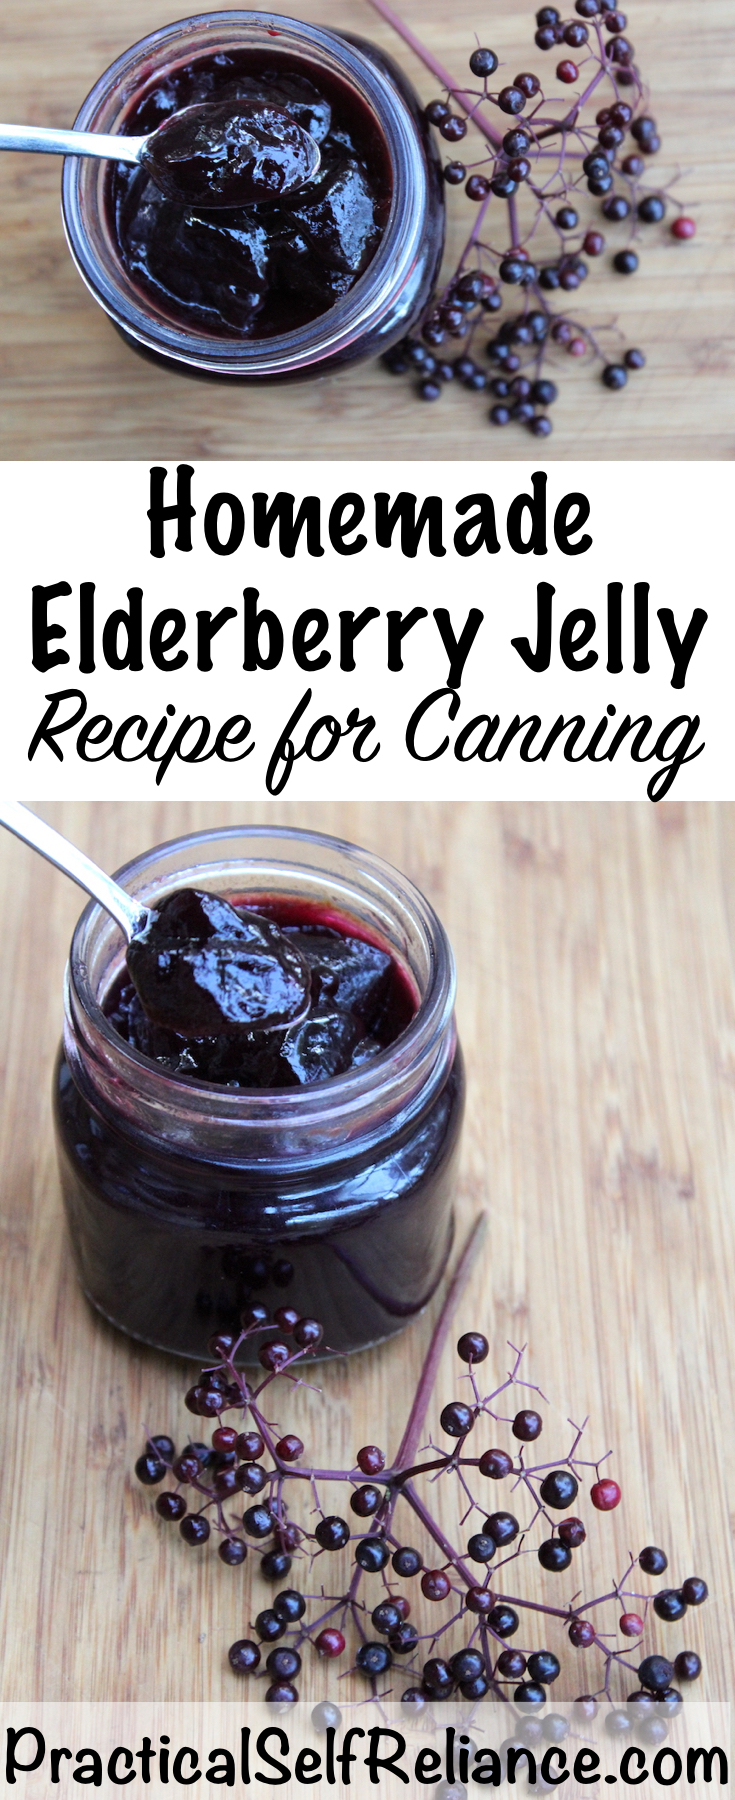 Elderberry Jelly Recipe for Canning #elderberry #recipe #canning #foodpreservation #jellyrecipes #elderberrysyrup  #herbalism #foraging #wildcrafting #wildedibles